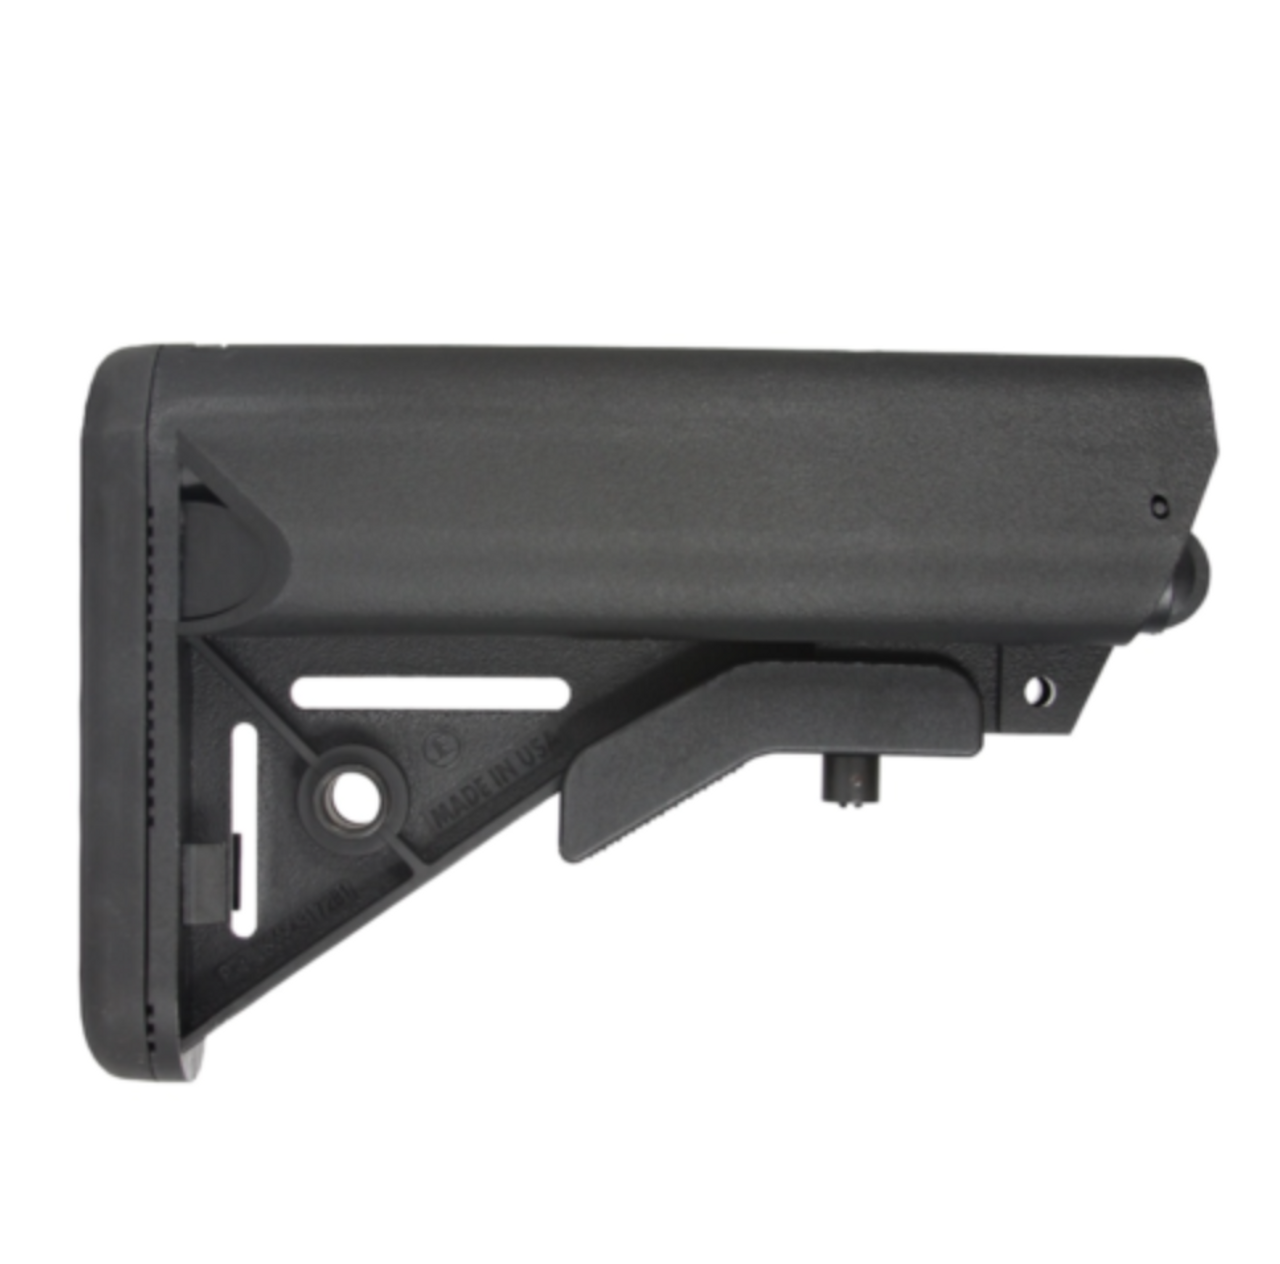 SOPMOD Mil-Spec Buttstock USA Made Black